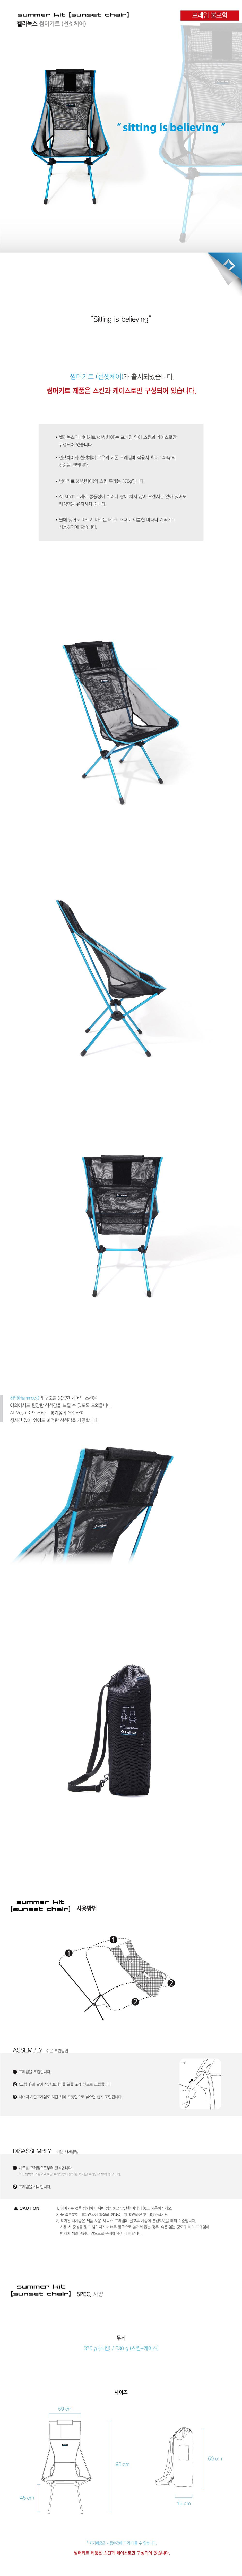 20170102-Summer-Kit-Sunset-Chair-상세페이지.jpg